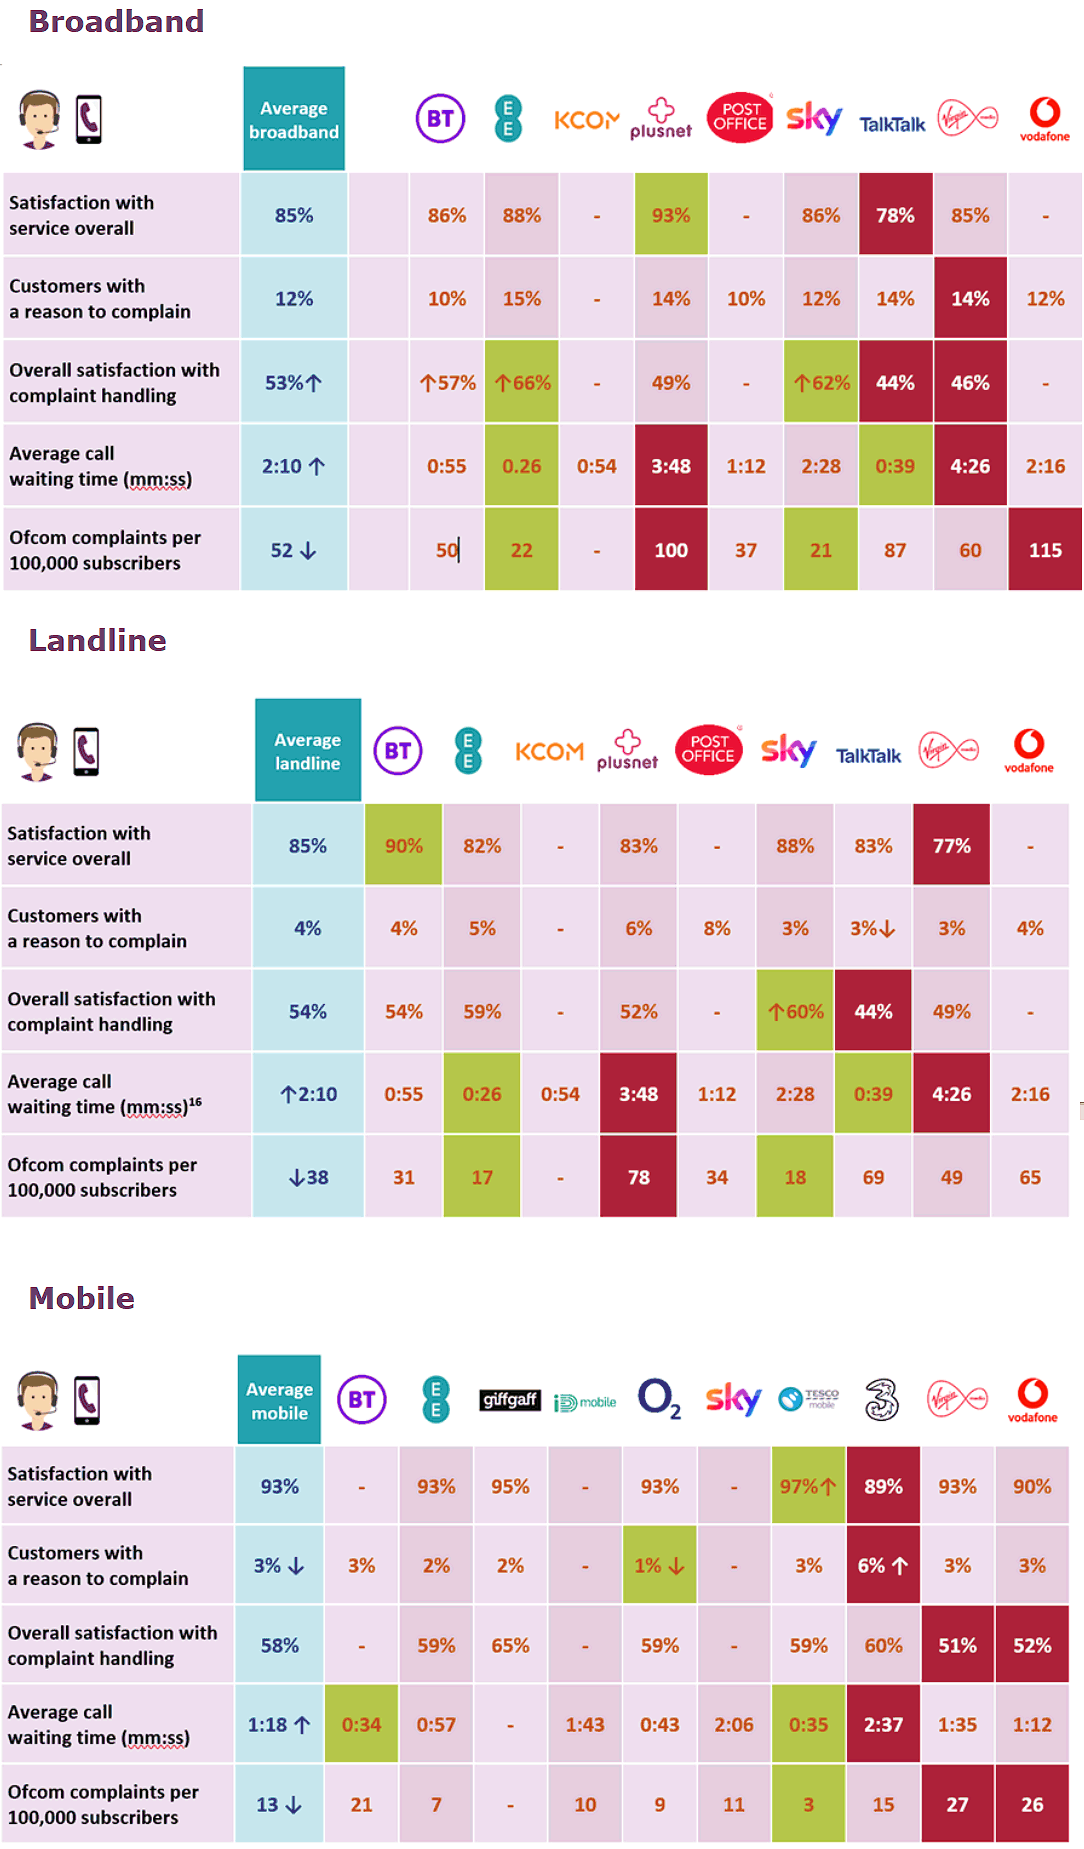 ofcom_2020_service_quality_by_uk_broadband_mobile_provider